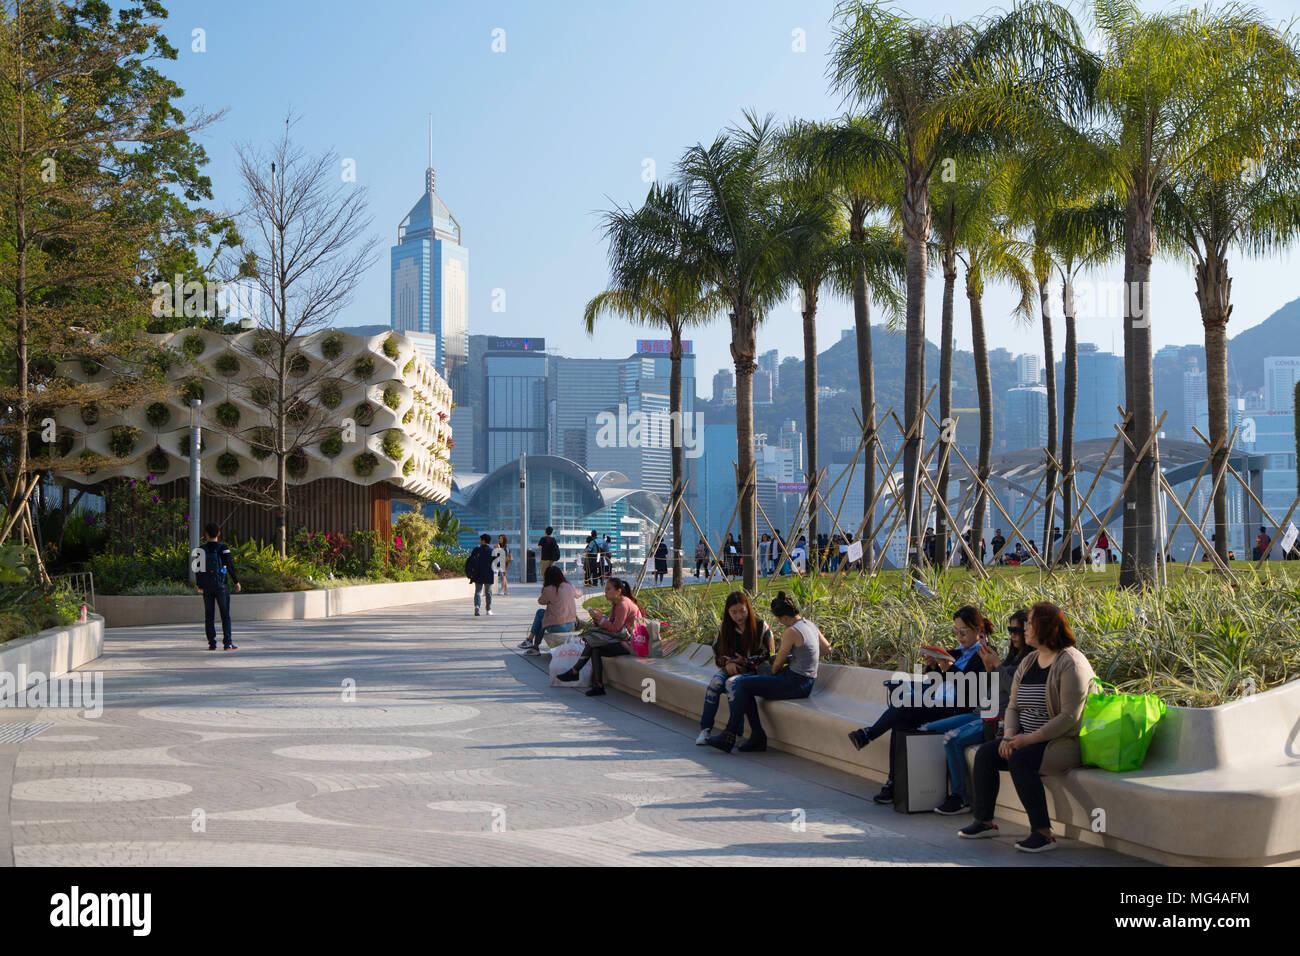 Salisbury Garden and skyline, Tsim Sha Tsui, Hong Kong - Stock Image